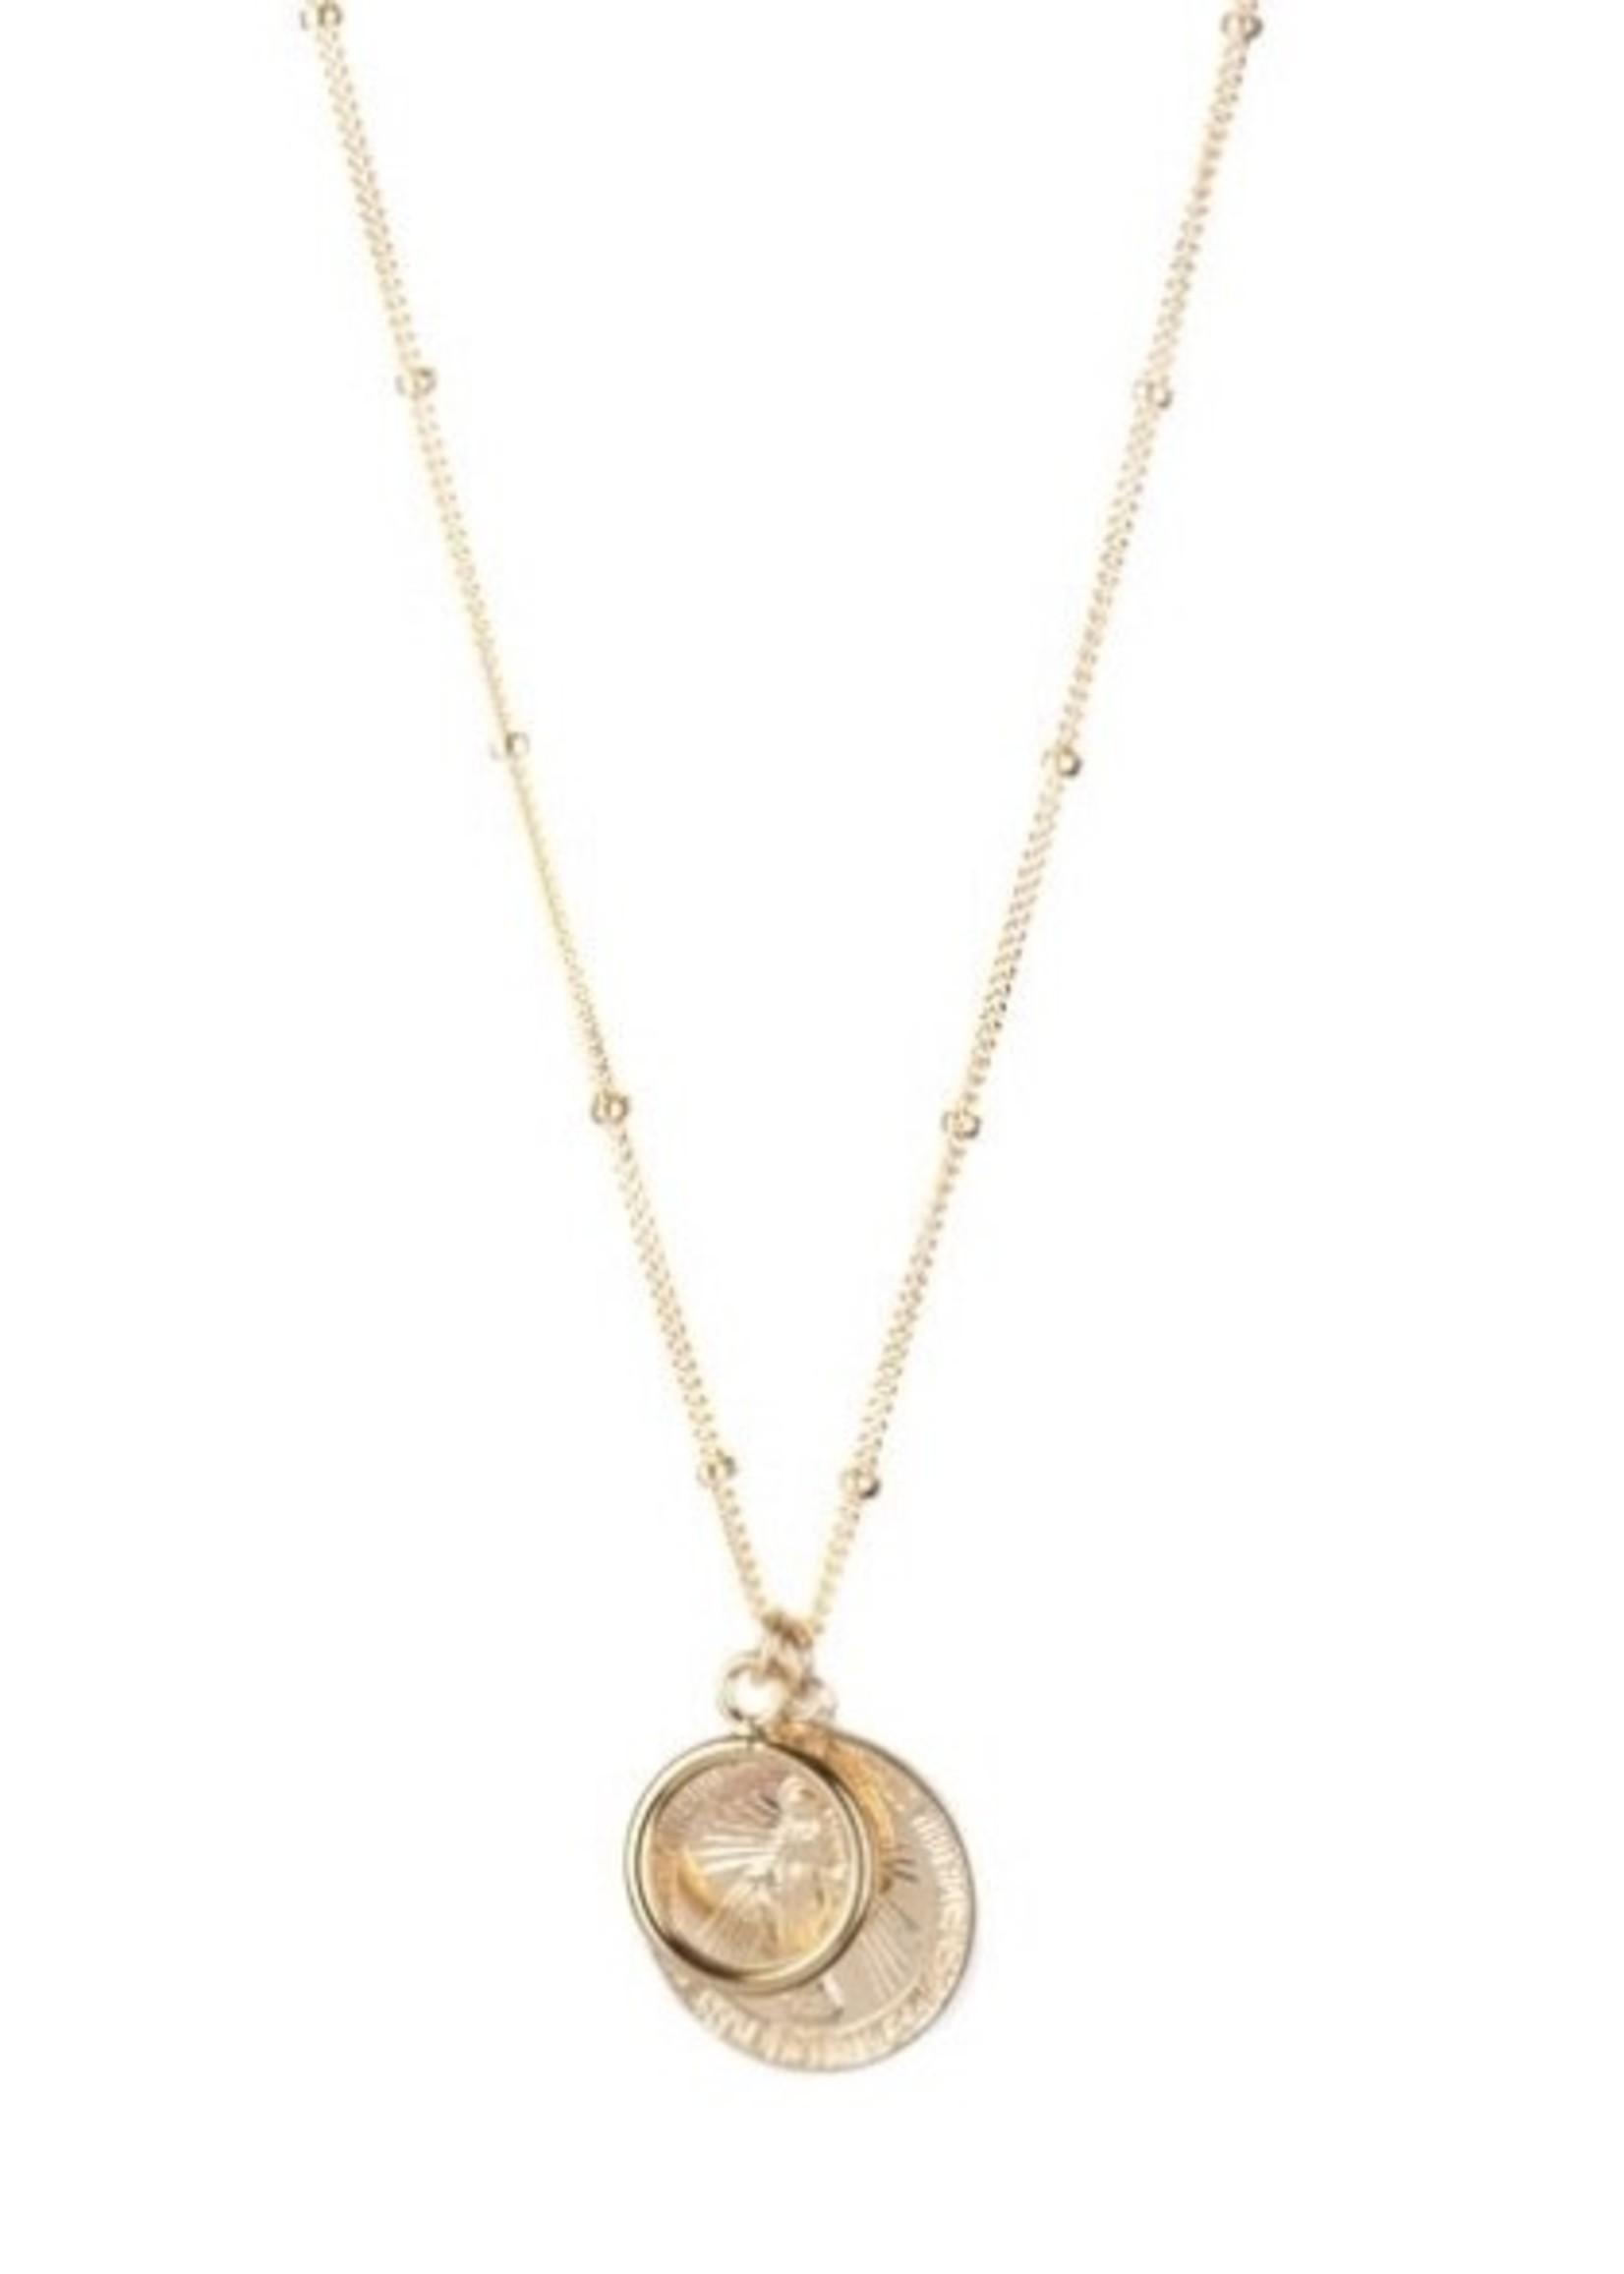 Lisbeth Cecile Necklace,14K gold fill